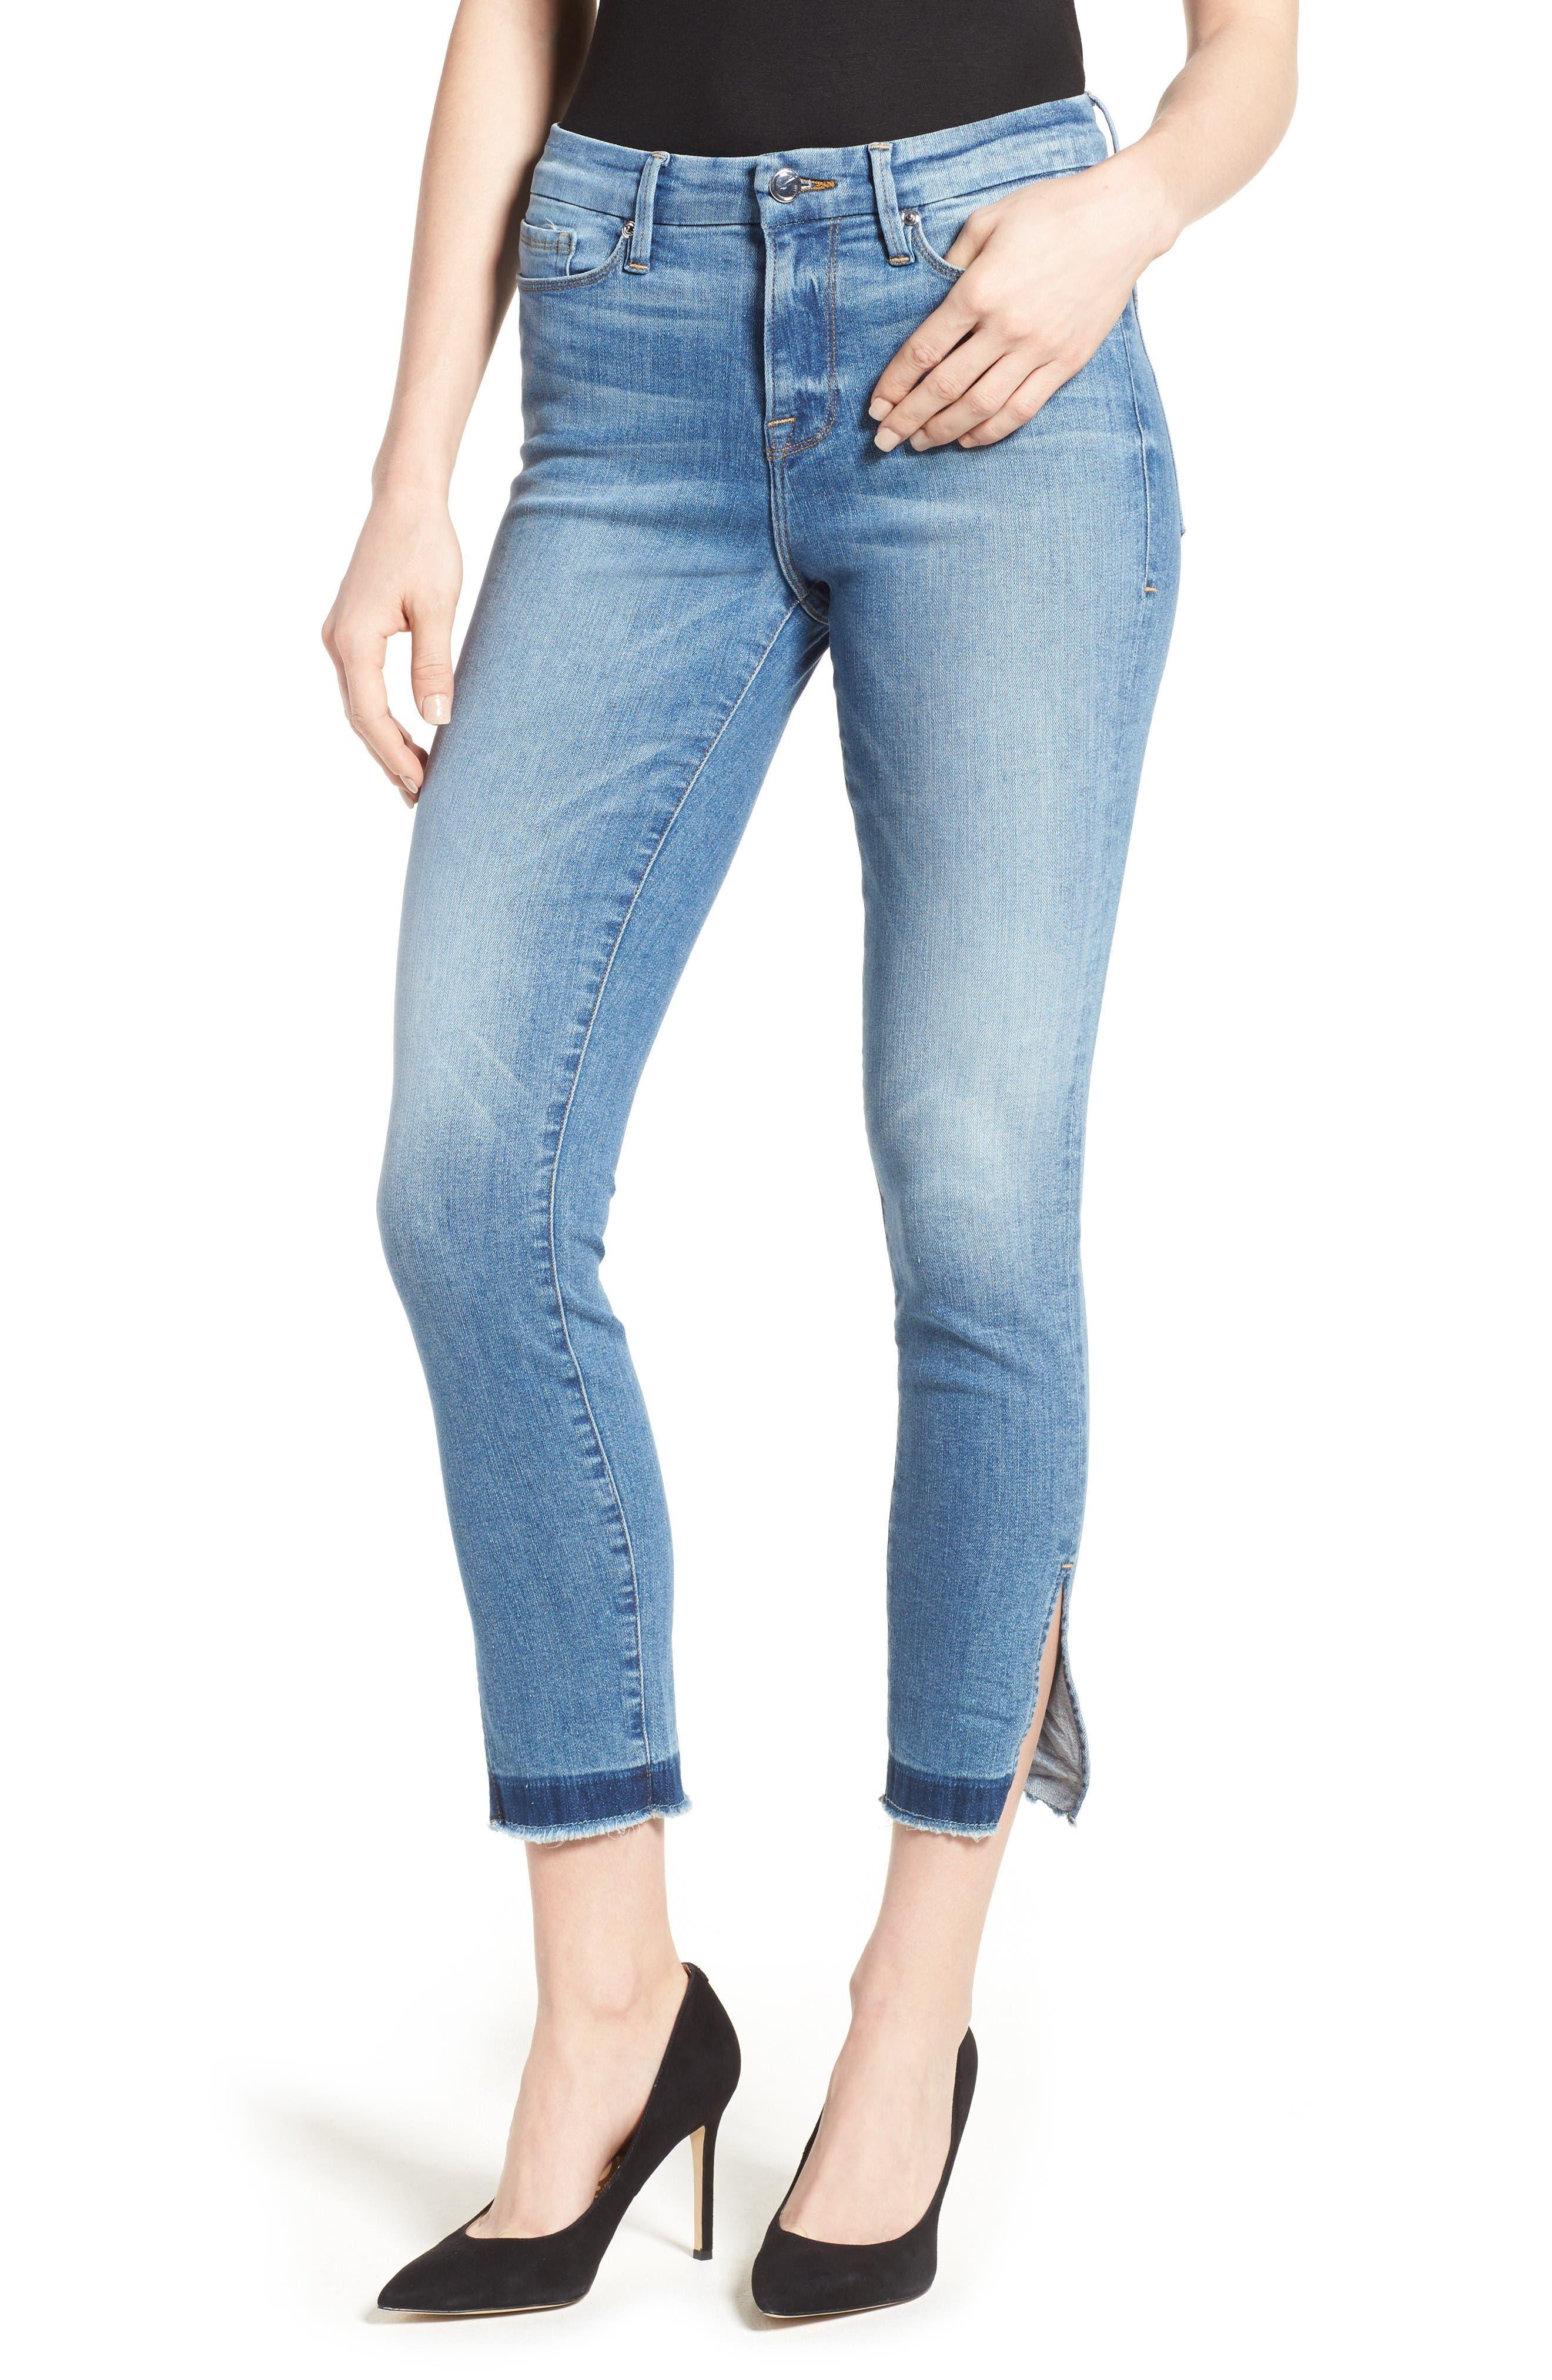 Alternate Image 1 Selected - Good American Good Legs High Rise Split Hem Crop Skinny Jeans (Blue 024) (Regular & Plus Size)